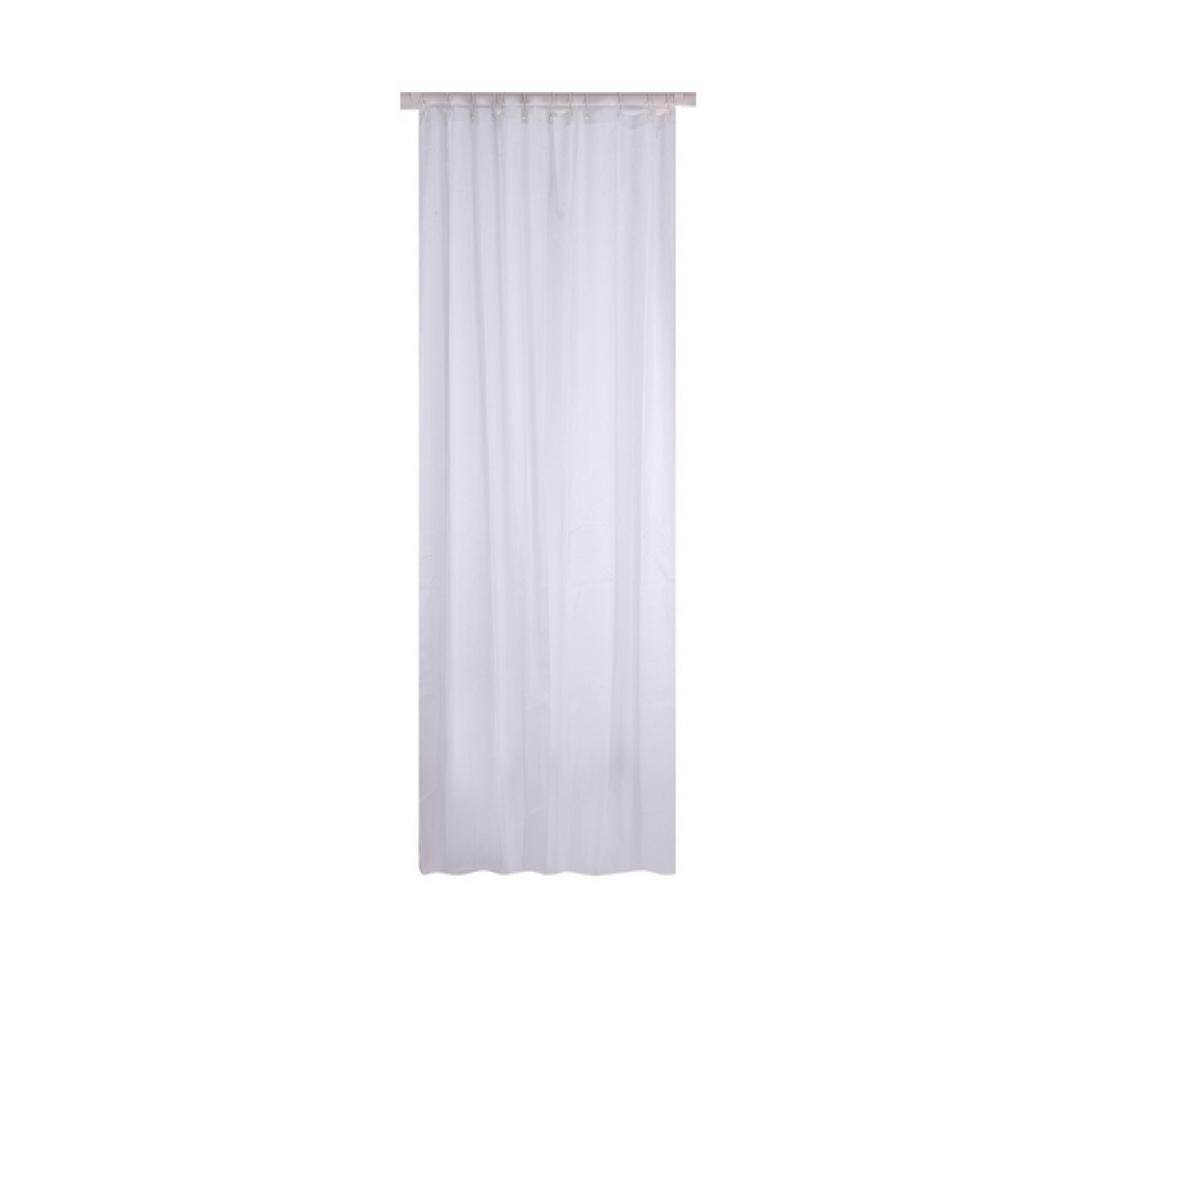 Show Curtain Cm. ม่านห้องน้ำ Poly Moya S01-2 180x200 ซม. By The Eight Shop